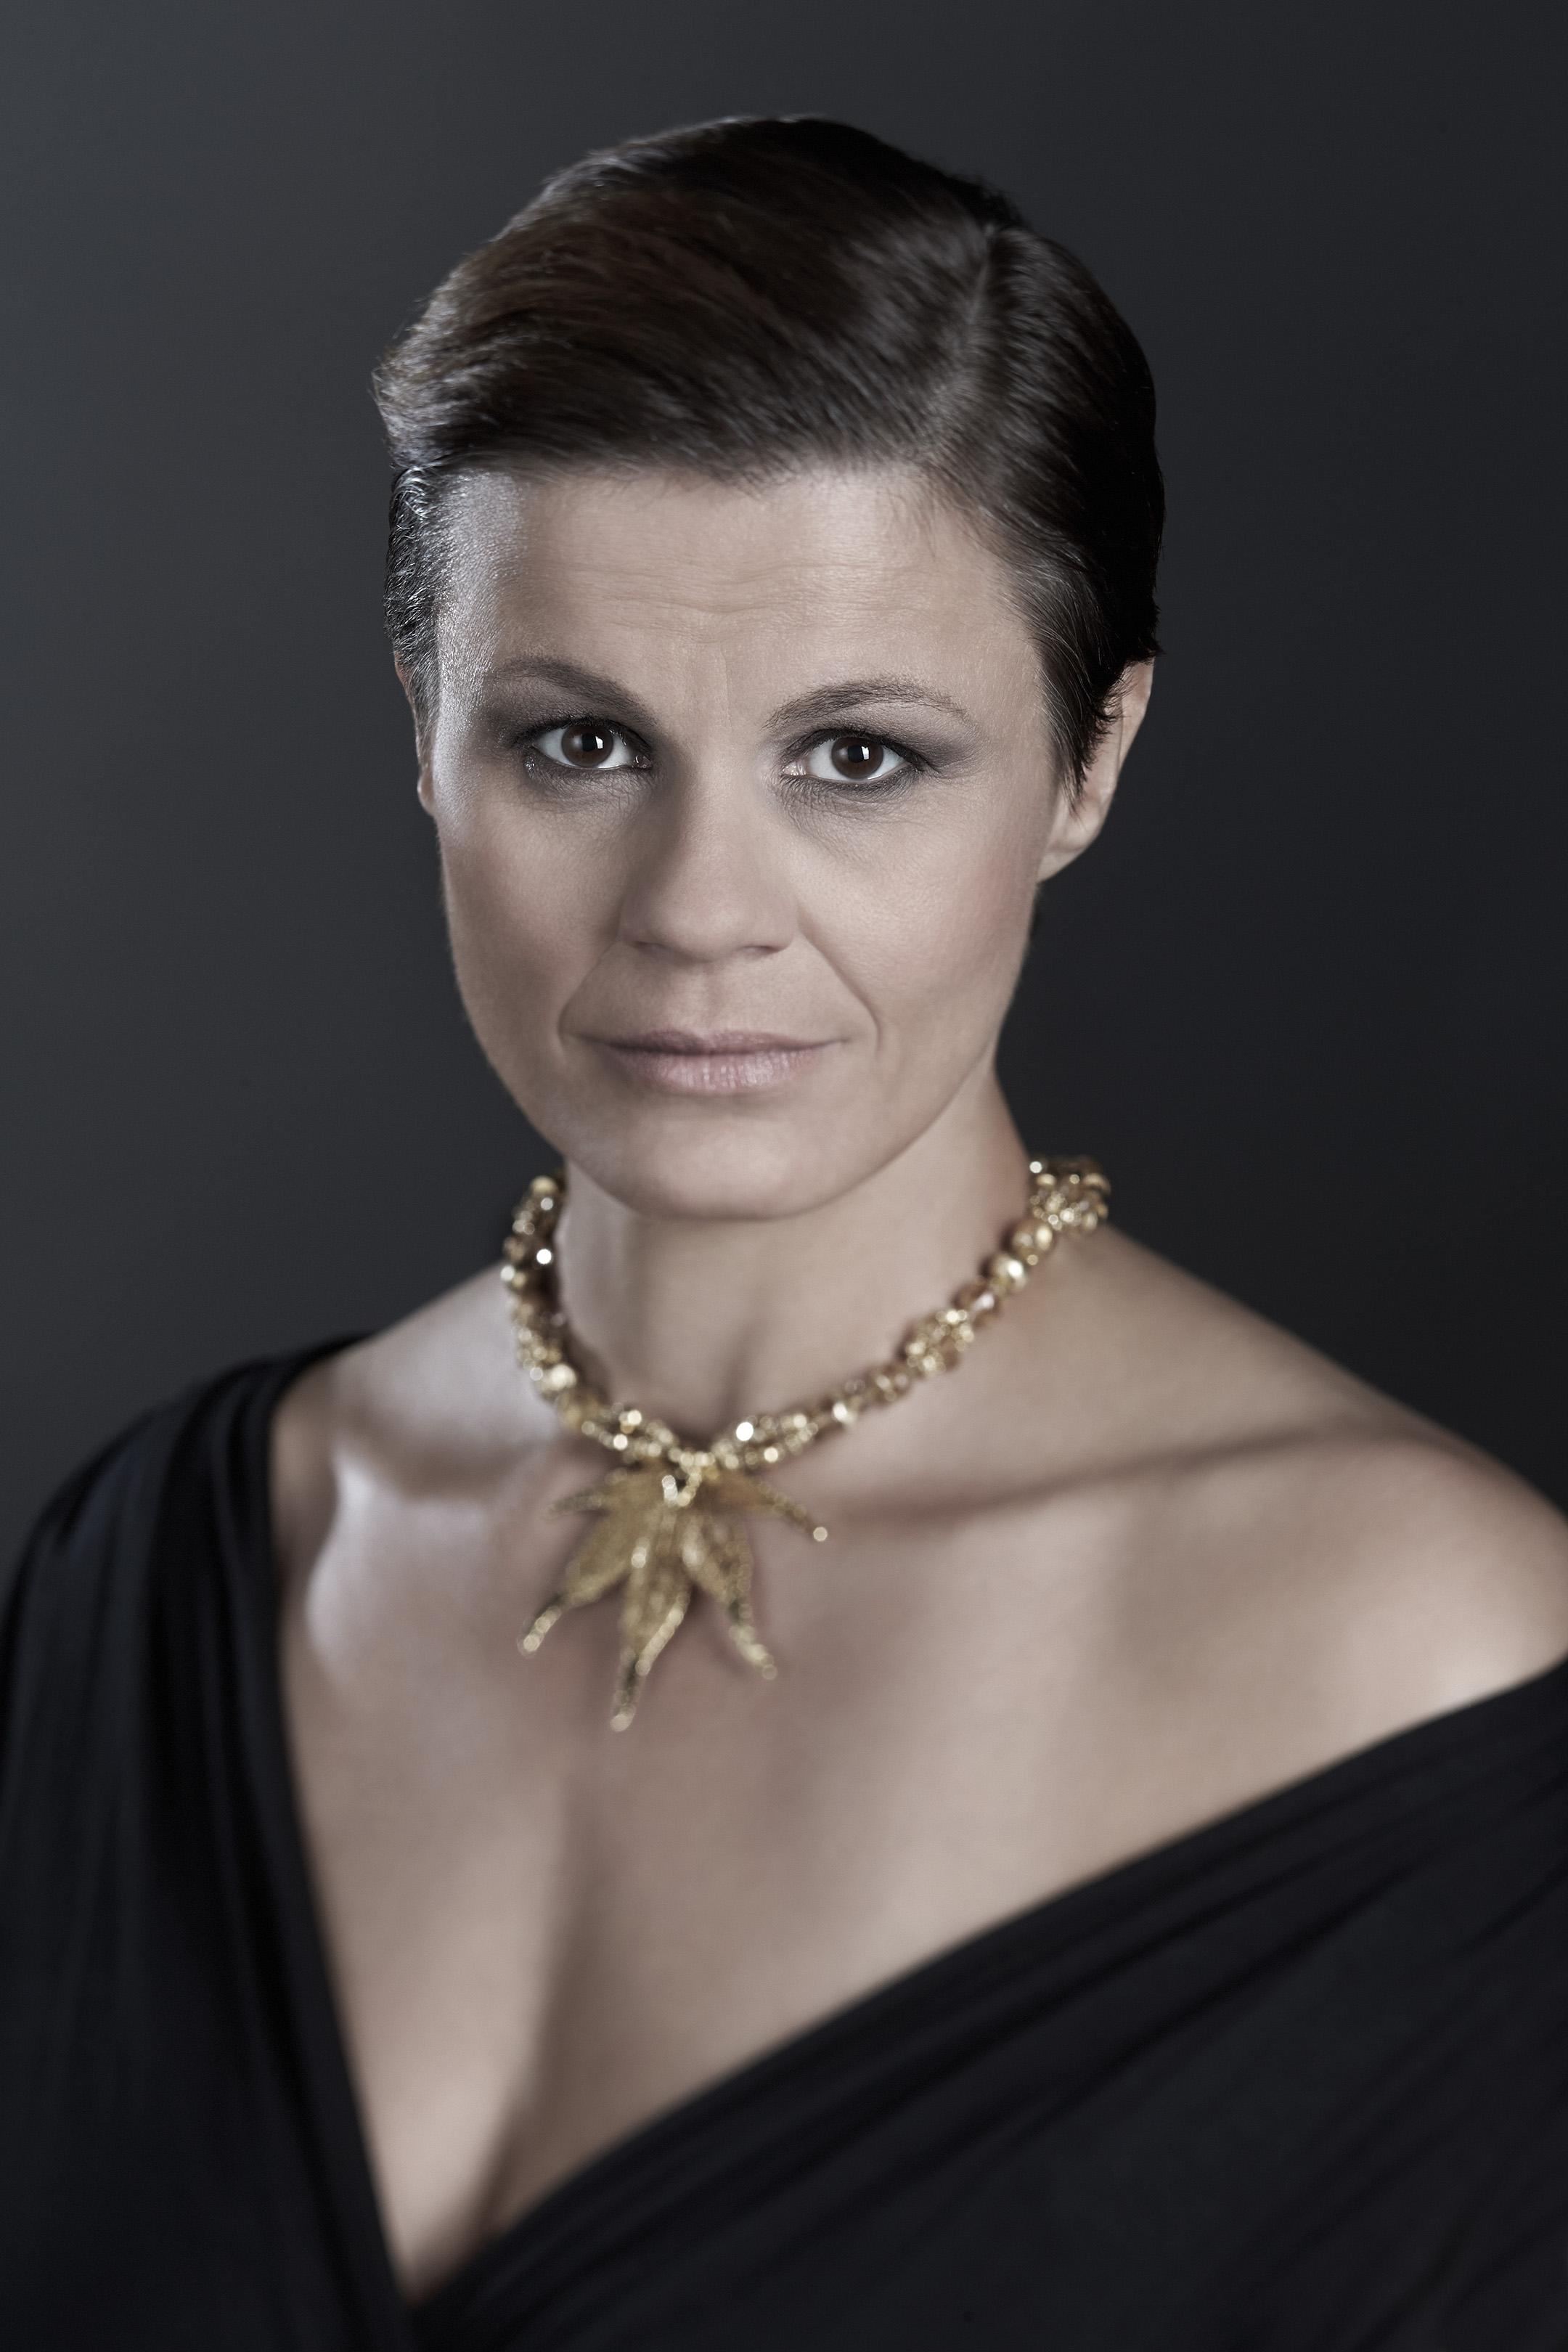 Eva Maria Pinczolich net worth